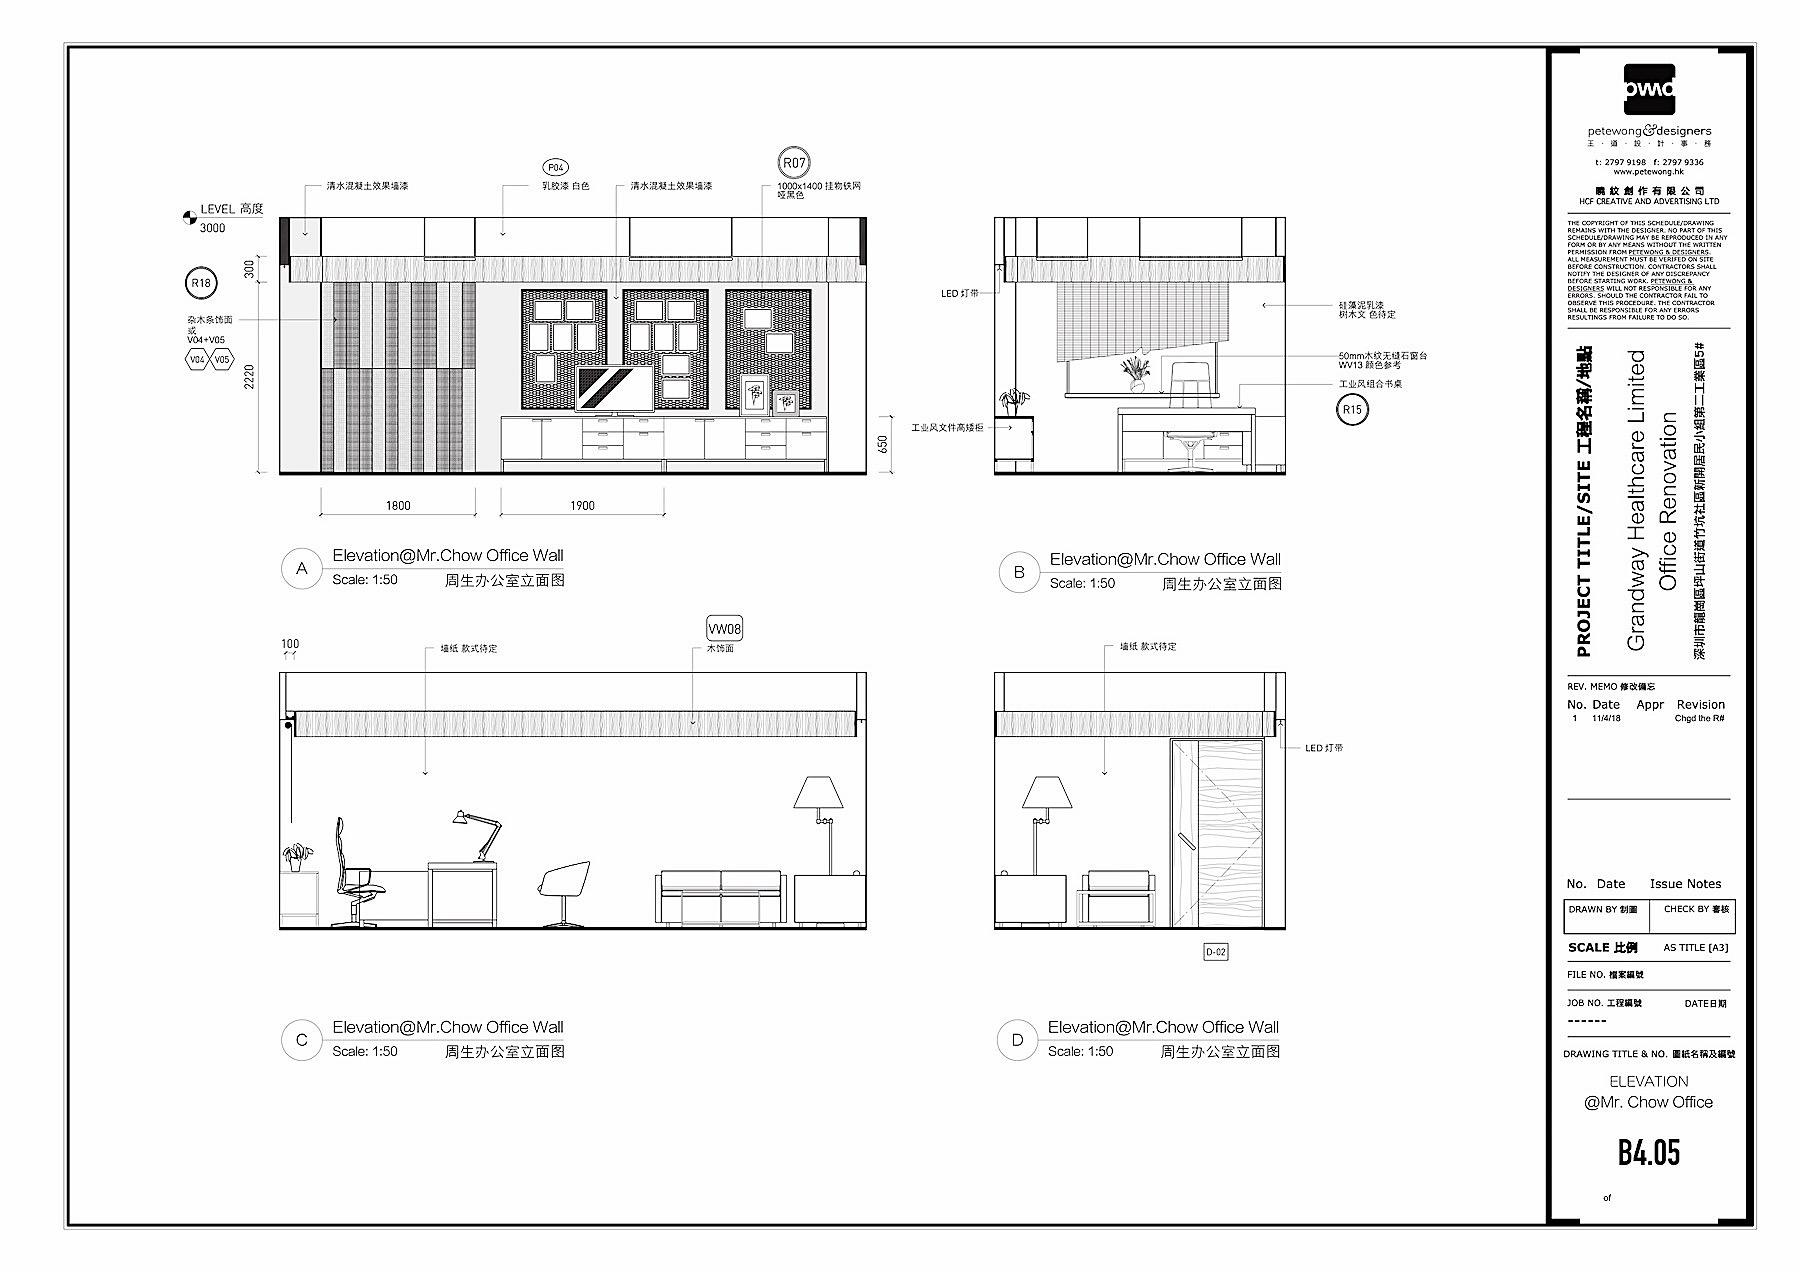 Grandway Office Renovation 2018 Drawing 13